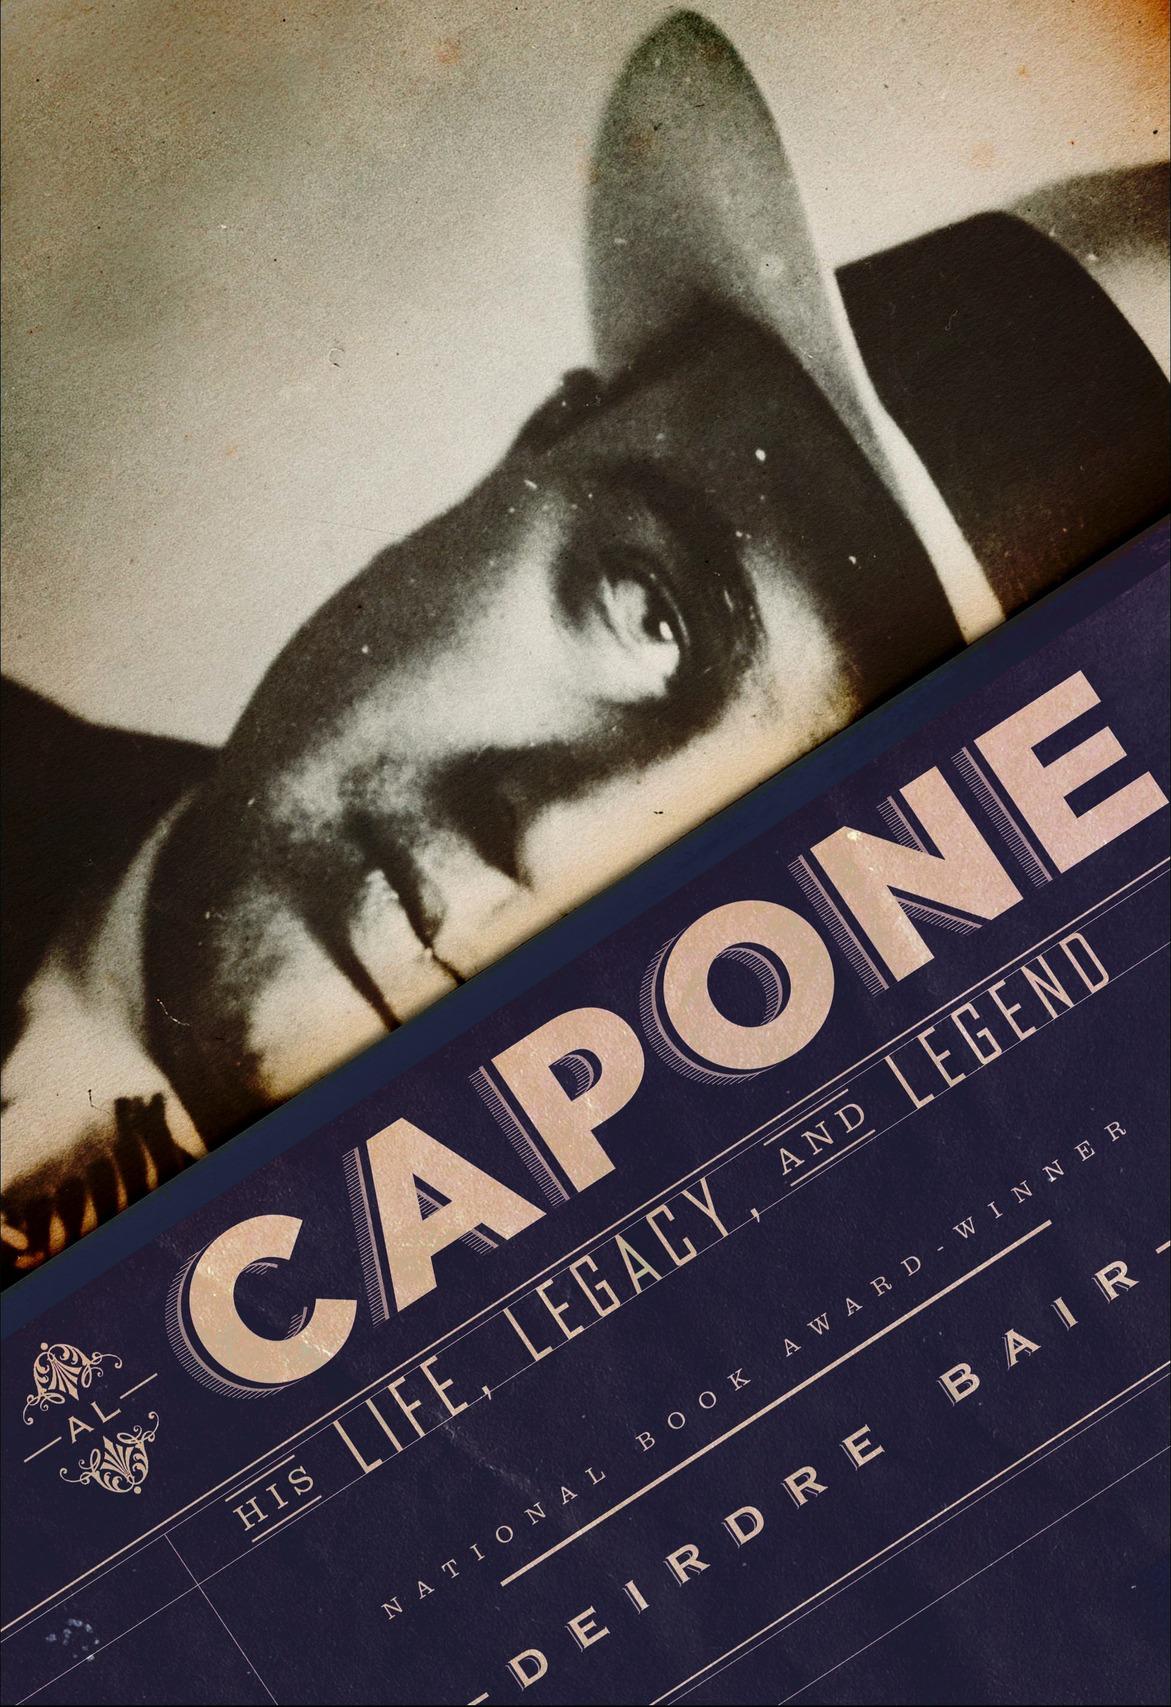 Al Capone omslag